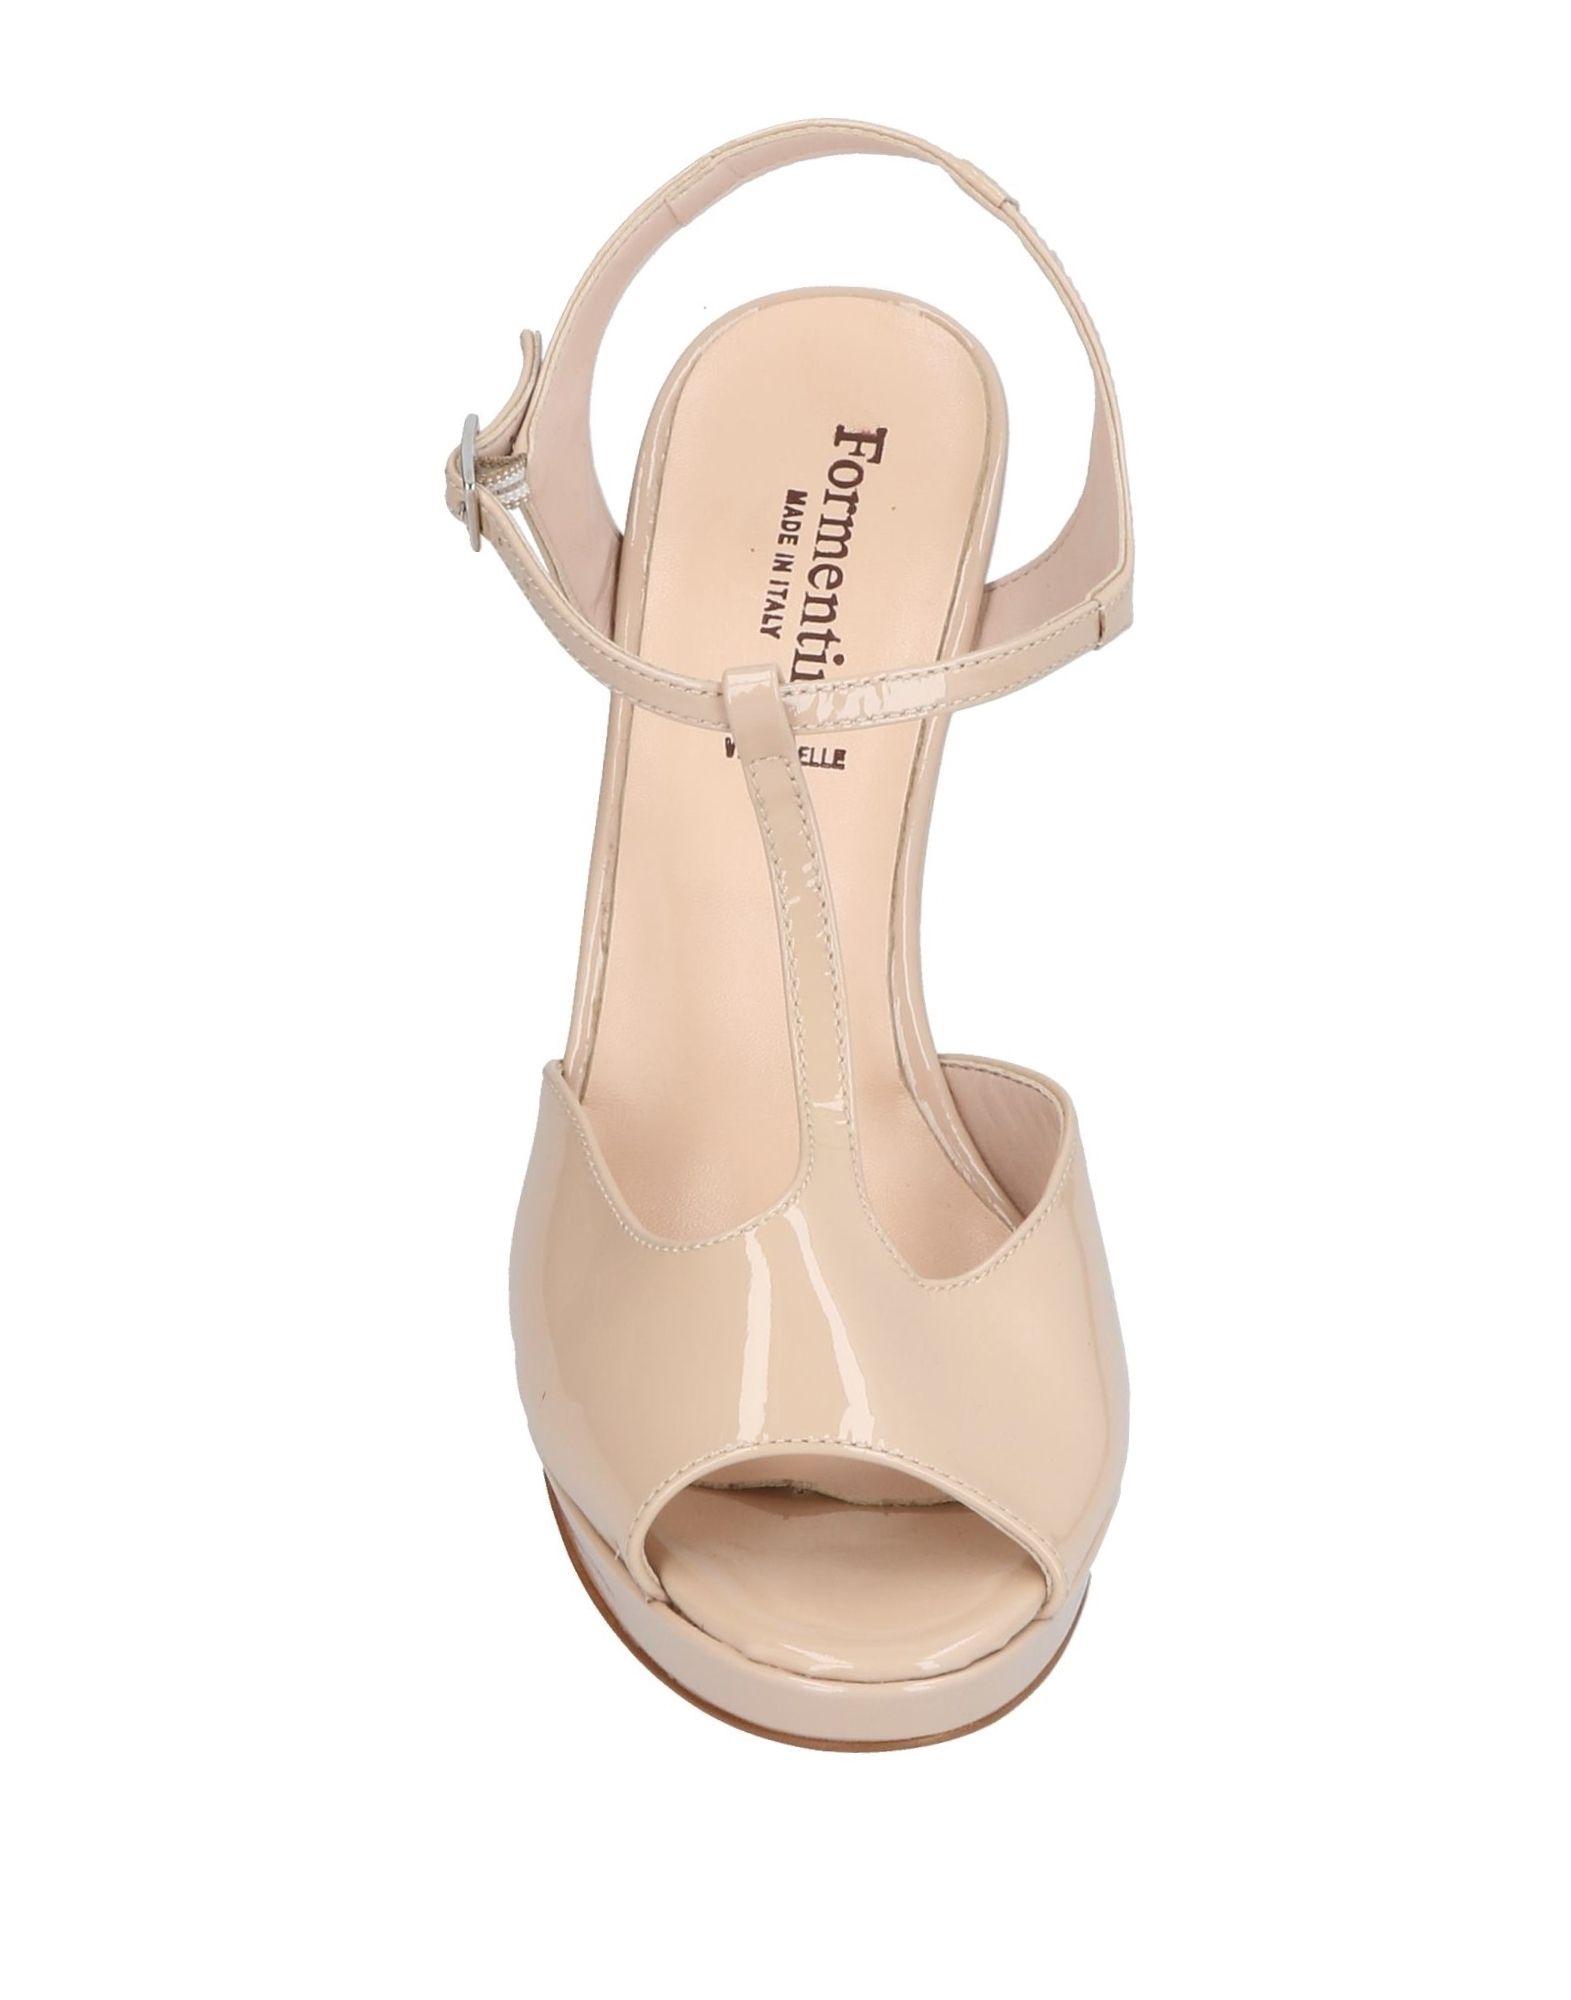 Sandales Formentini Femme - Sandales Formentini sur